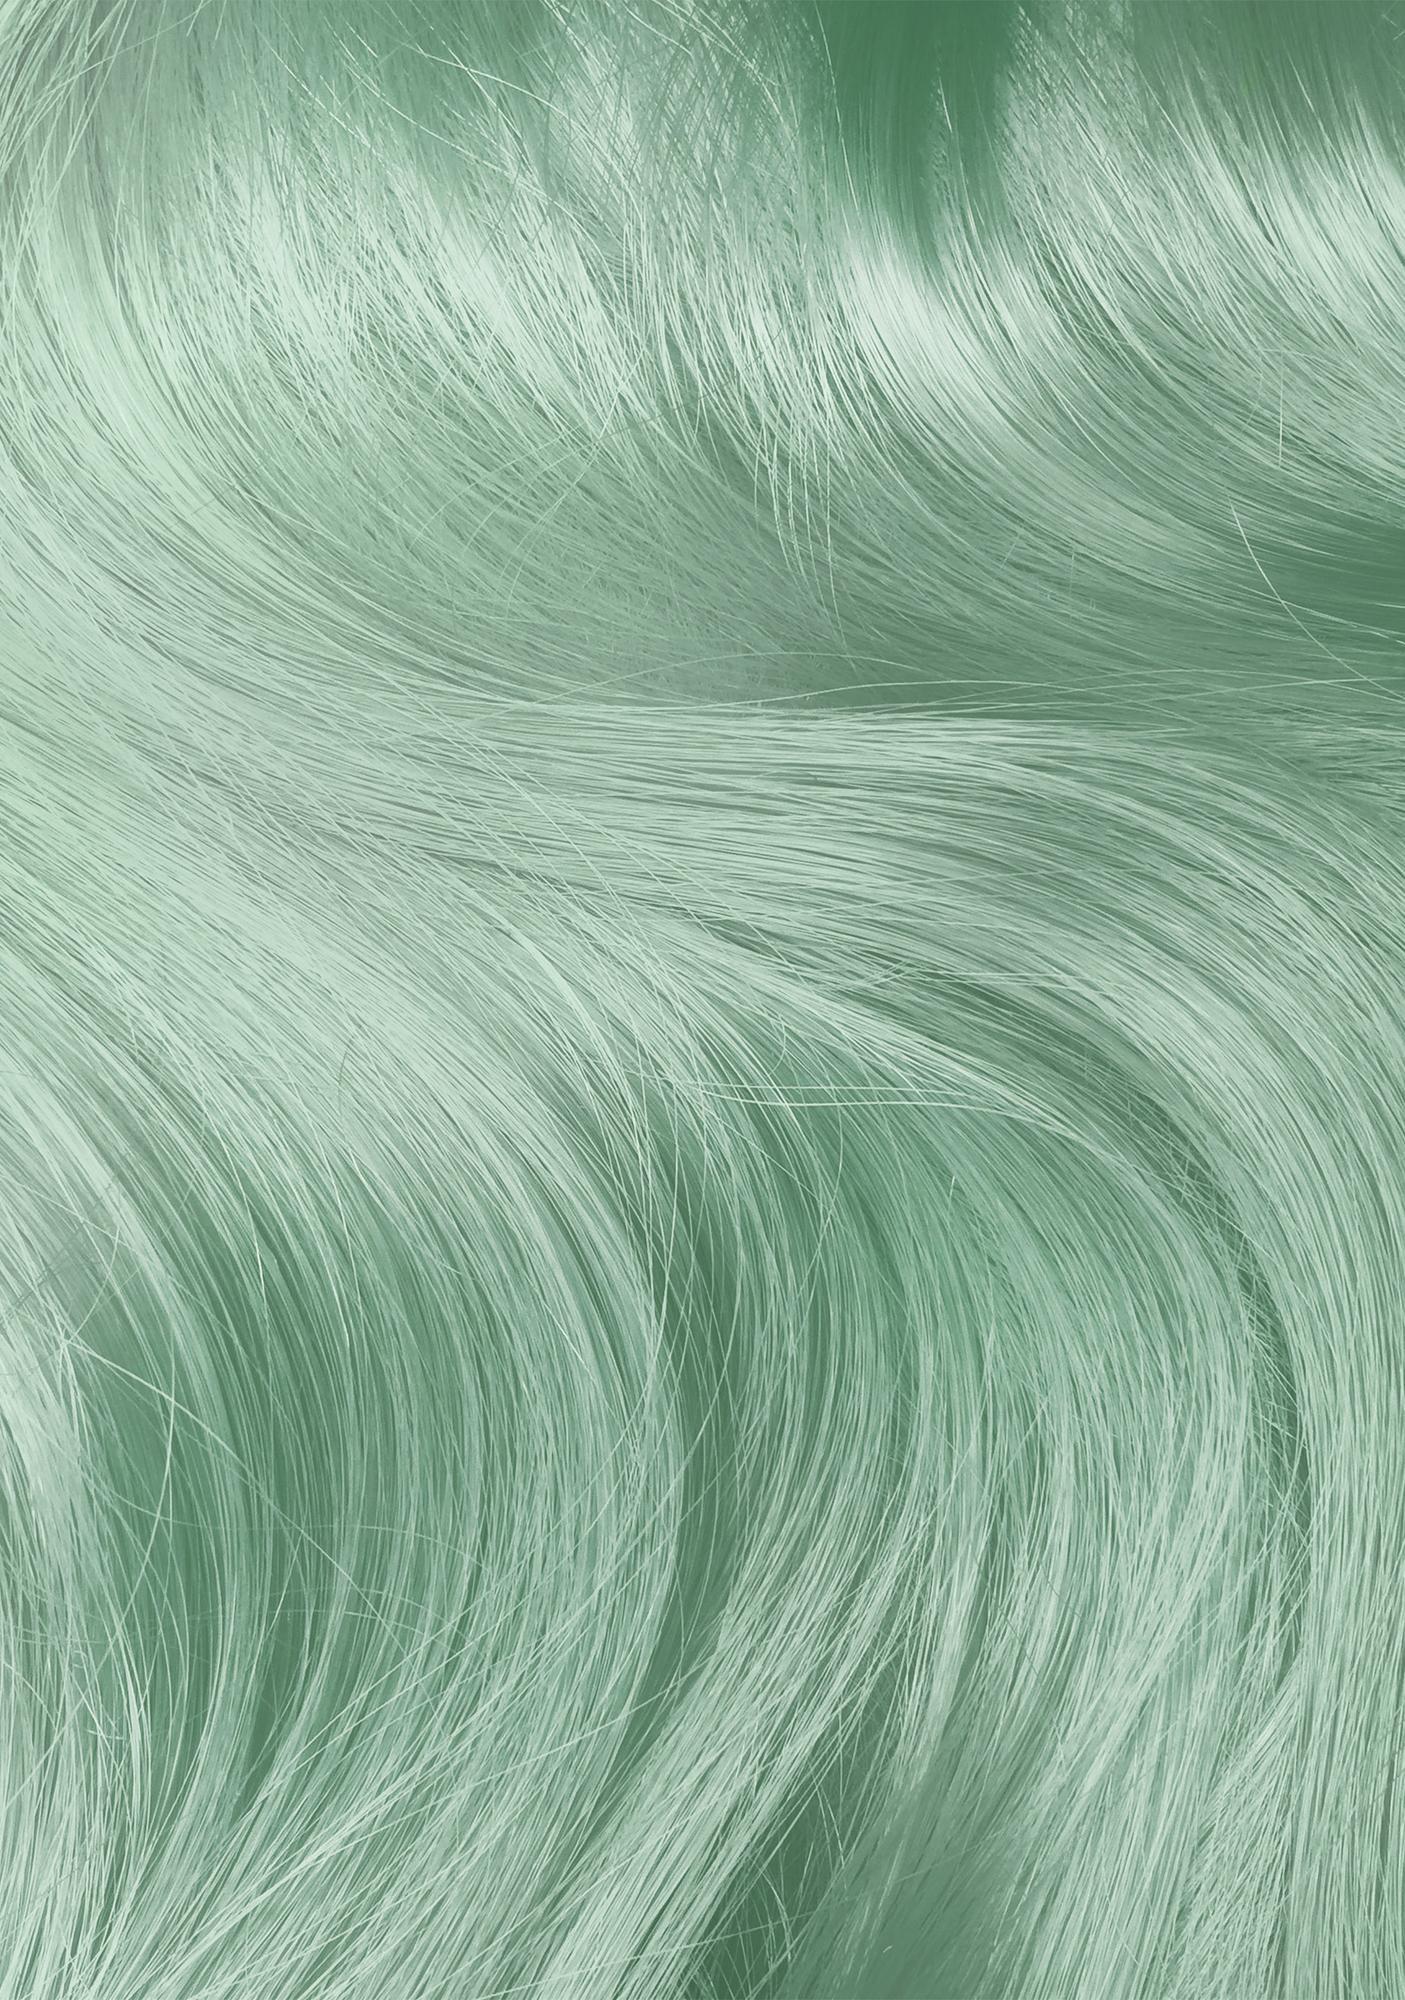 Lime Crime Mint Ice Unicorn Hair Dye